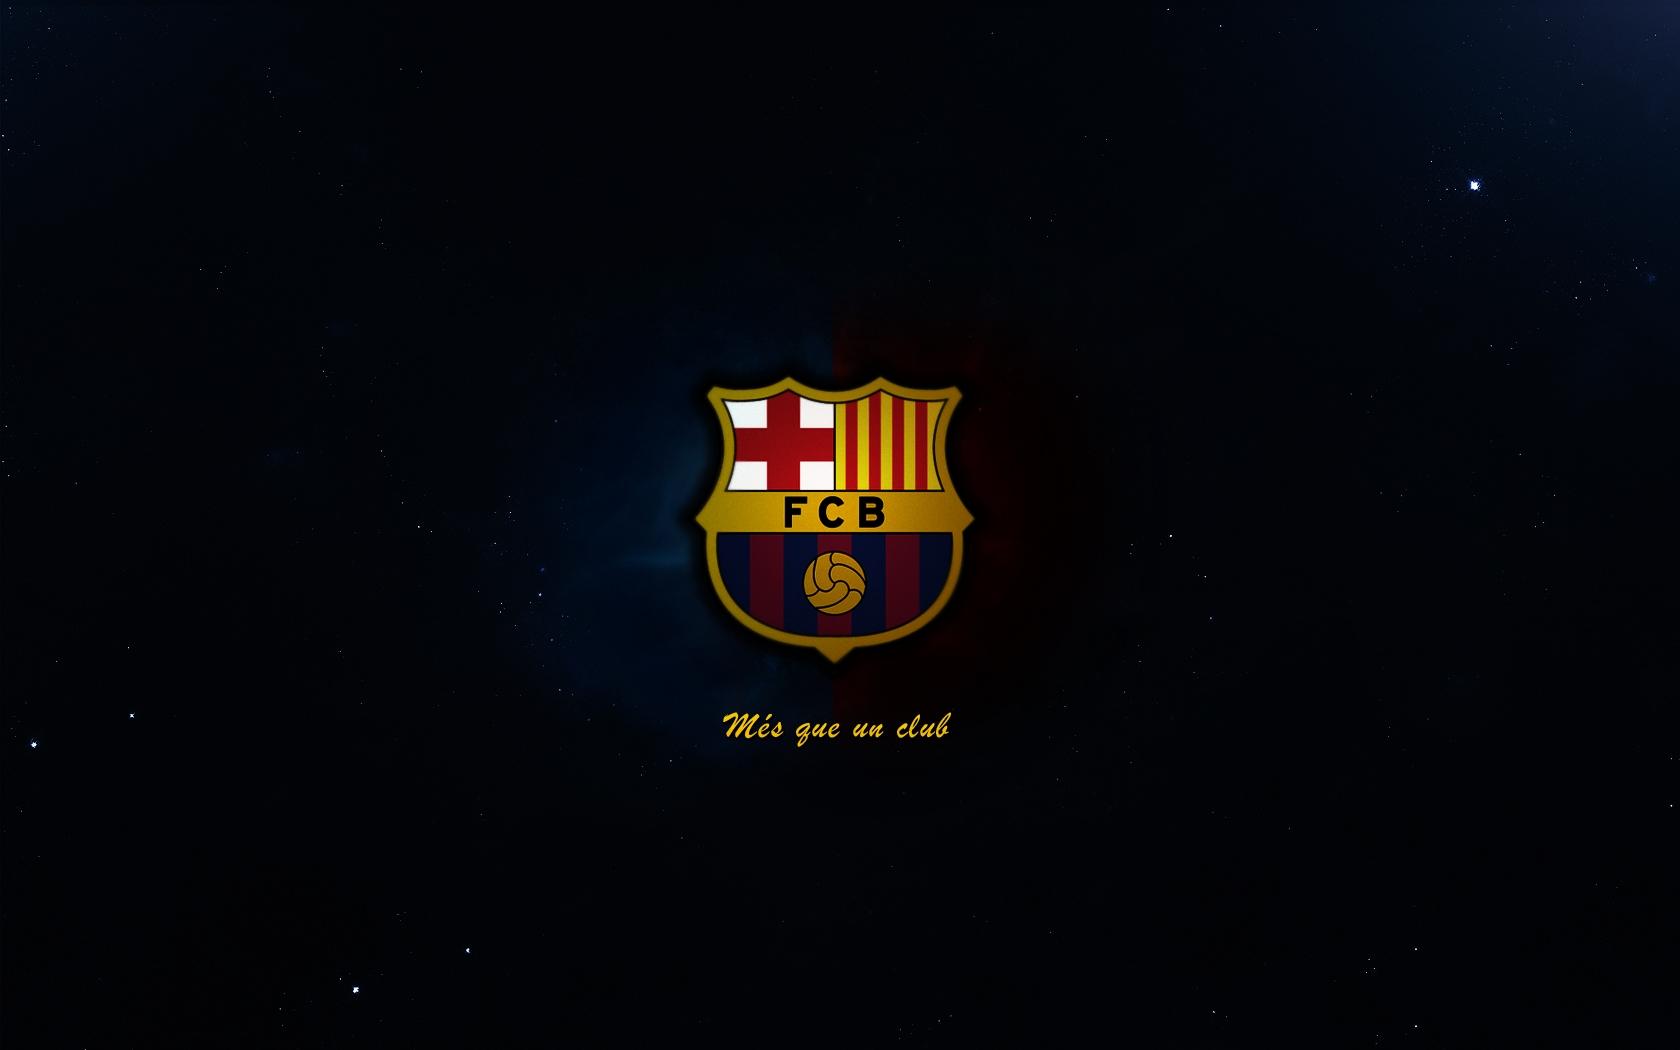 Title : fc barcelona best logo wallpapers | misc | pinterest. Dimension : 1680 x 1050. File Type : JPG/JPEG